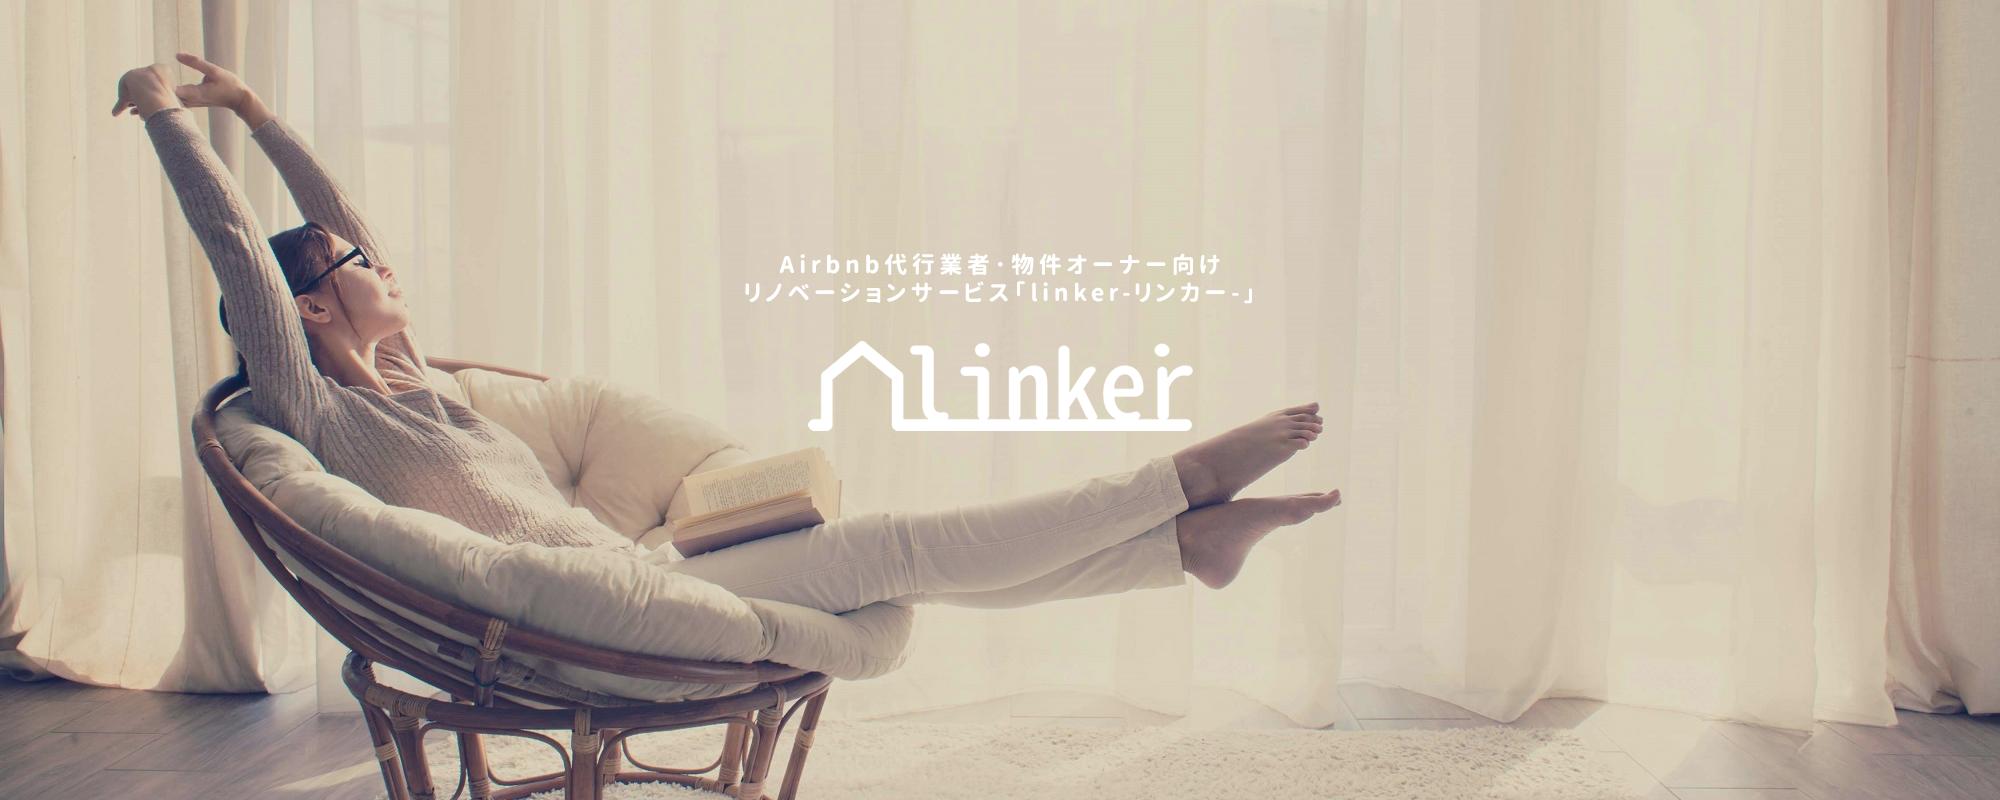 Airbnb代行業者・物件オーナー向けリノベーションサービス「linker -リンカー-」